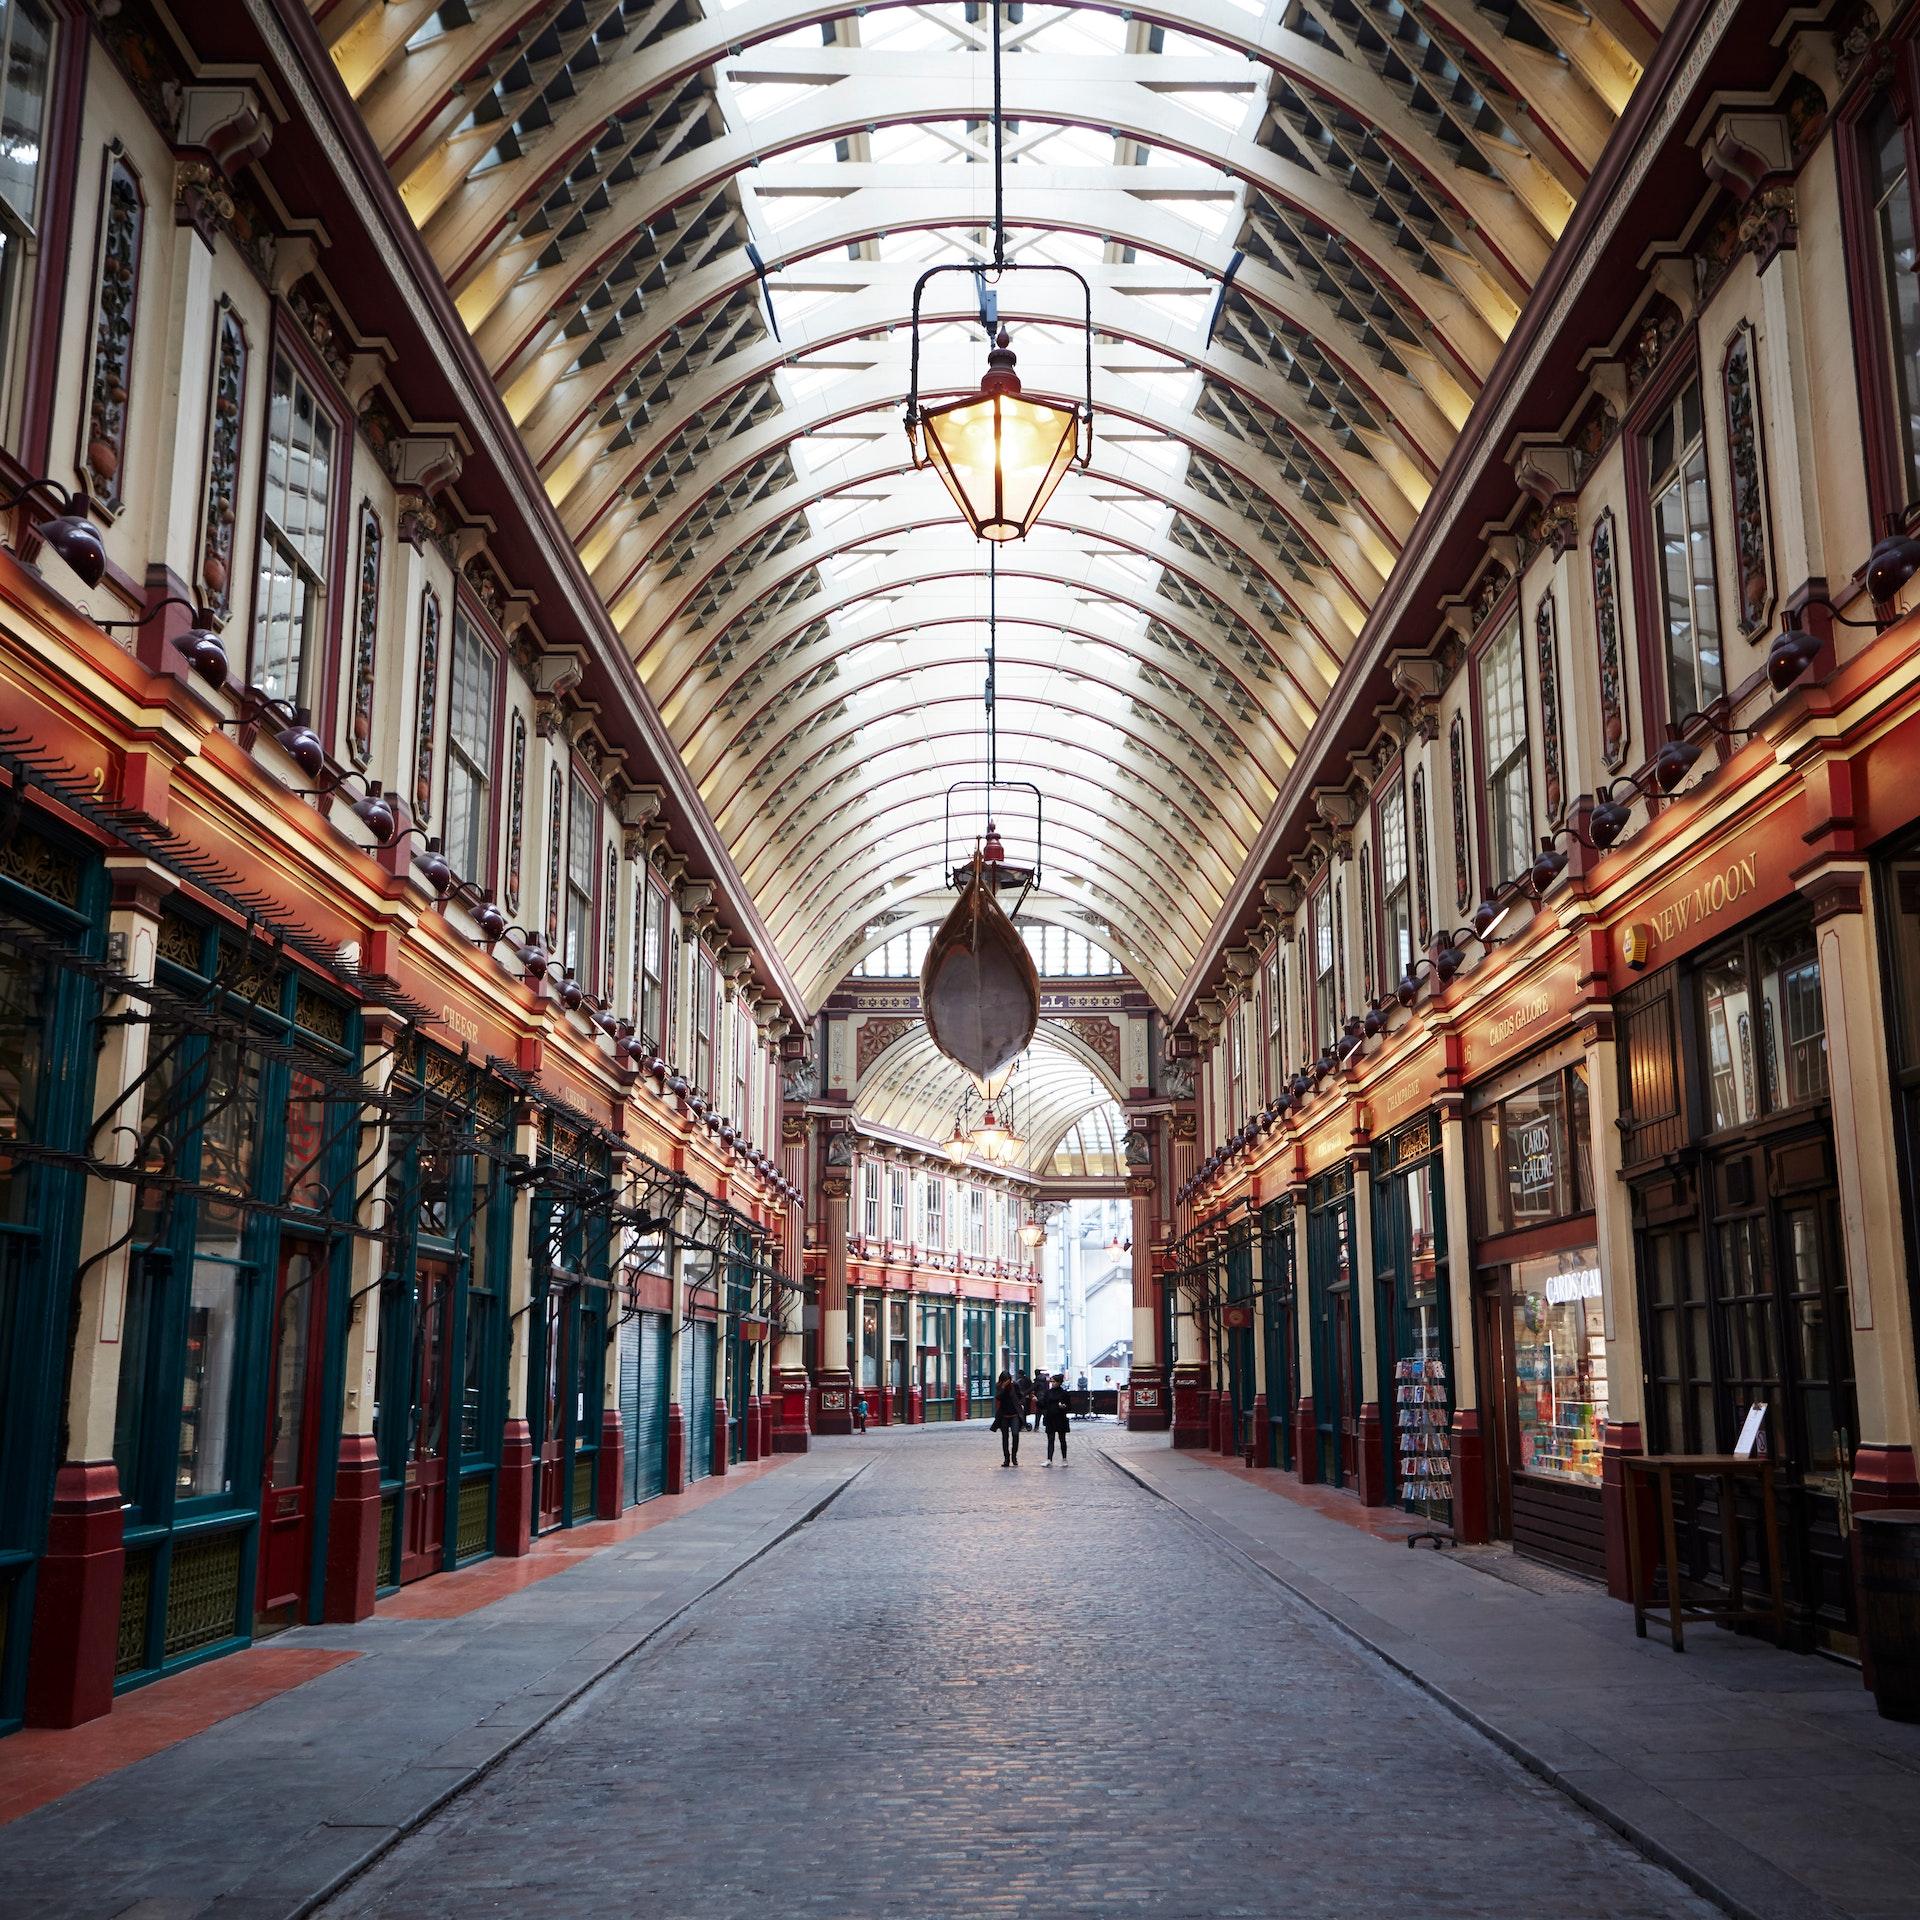 Interior of Leadenhall Market, London